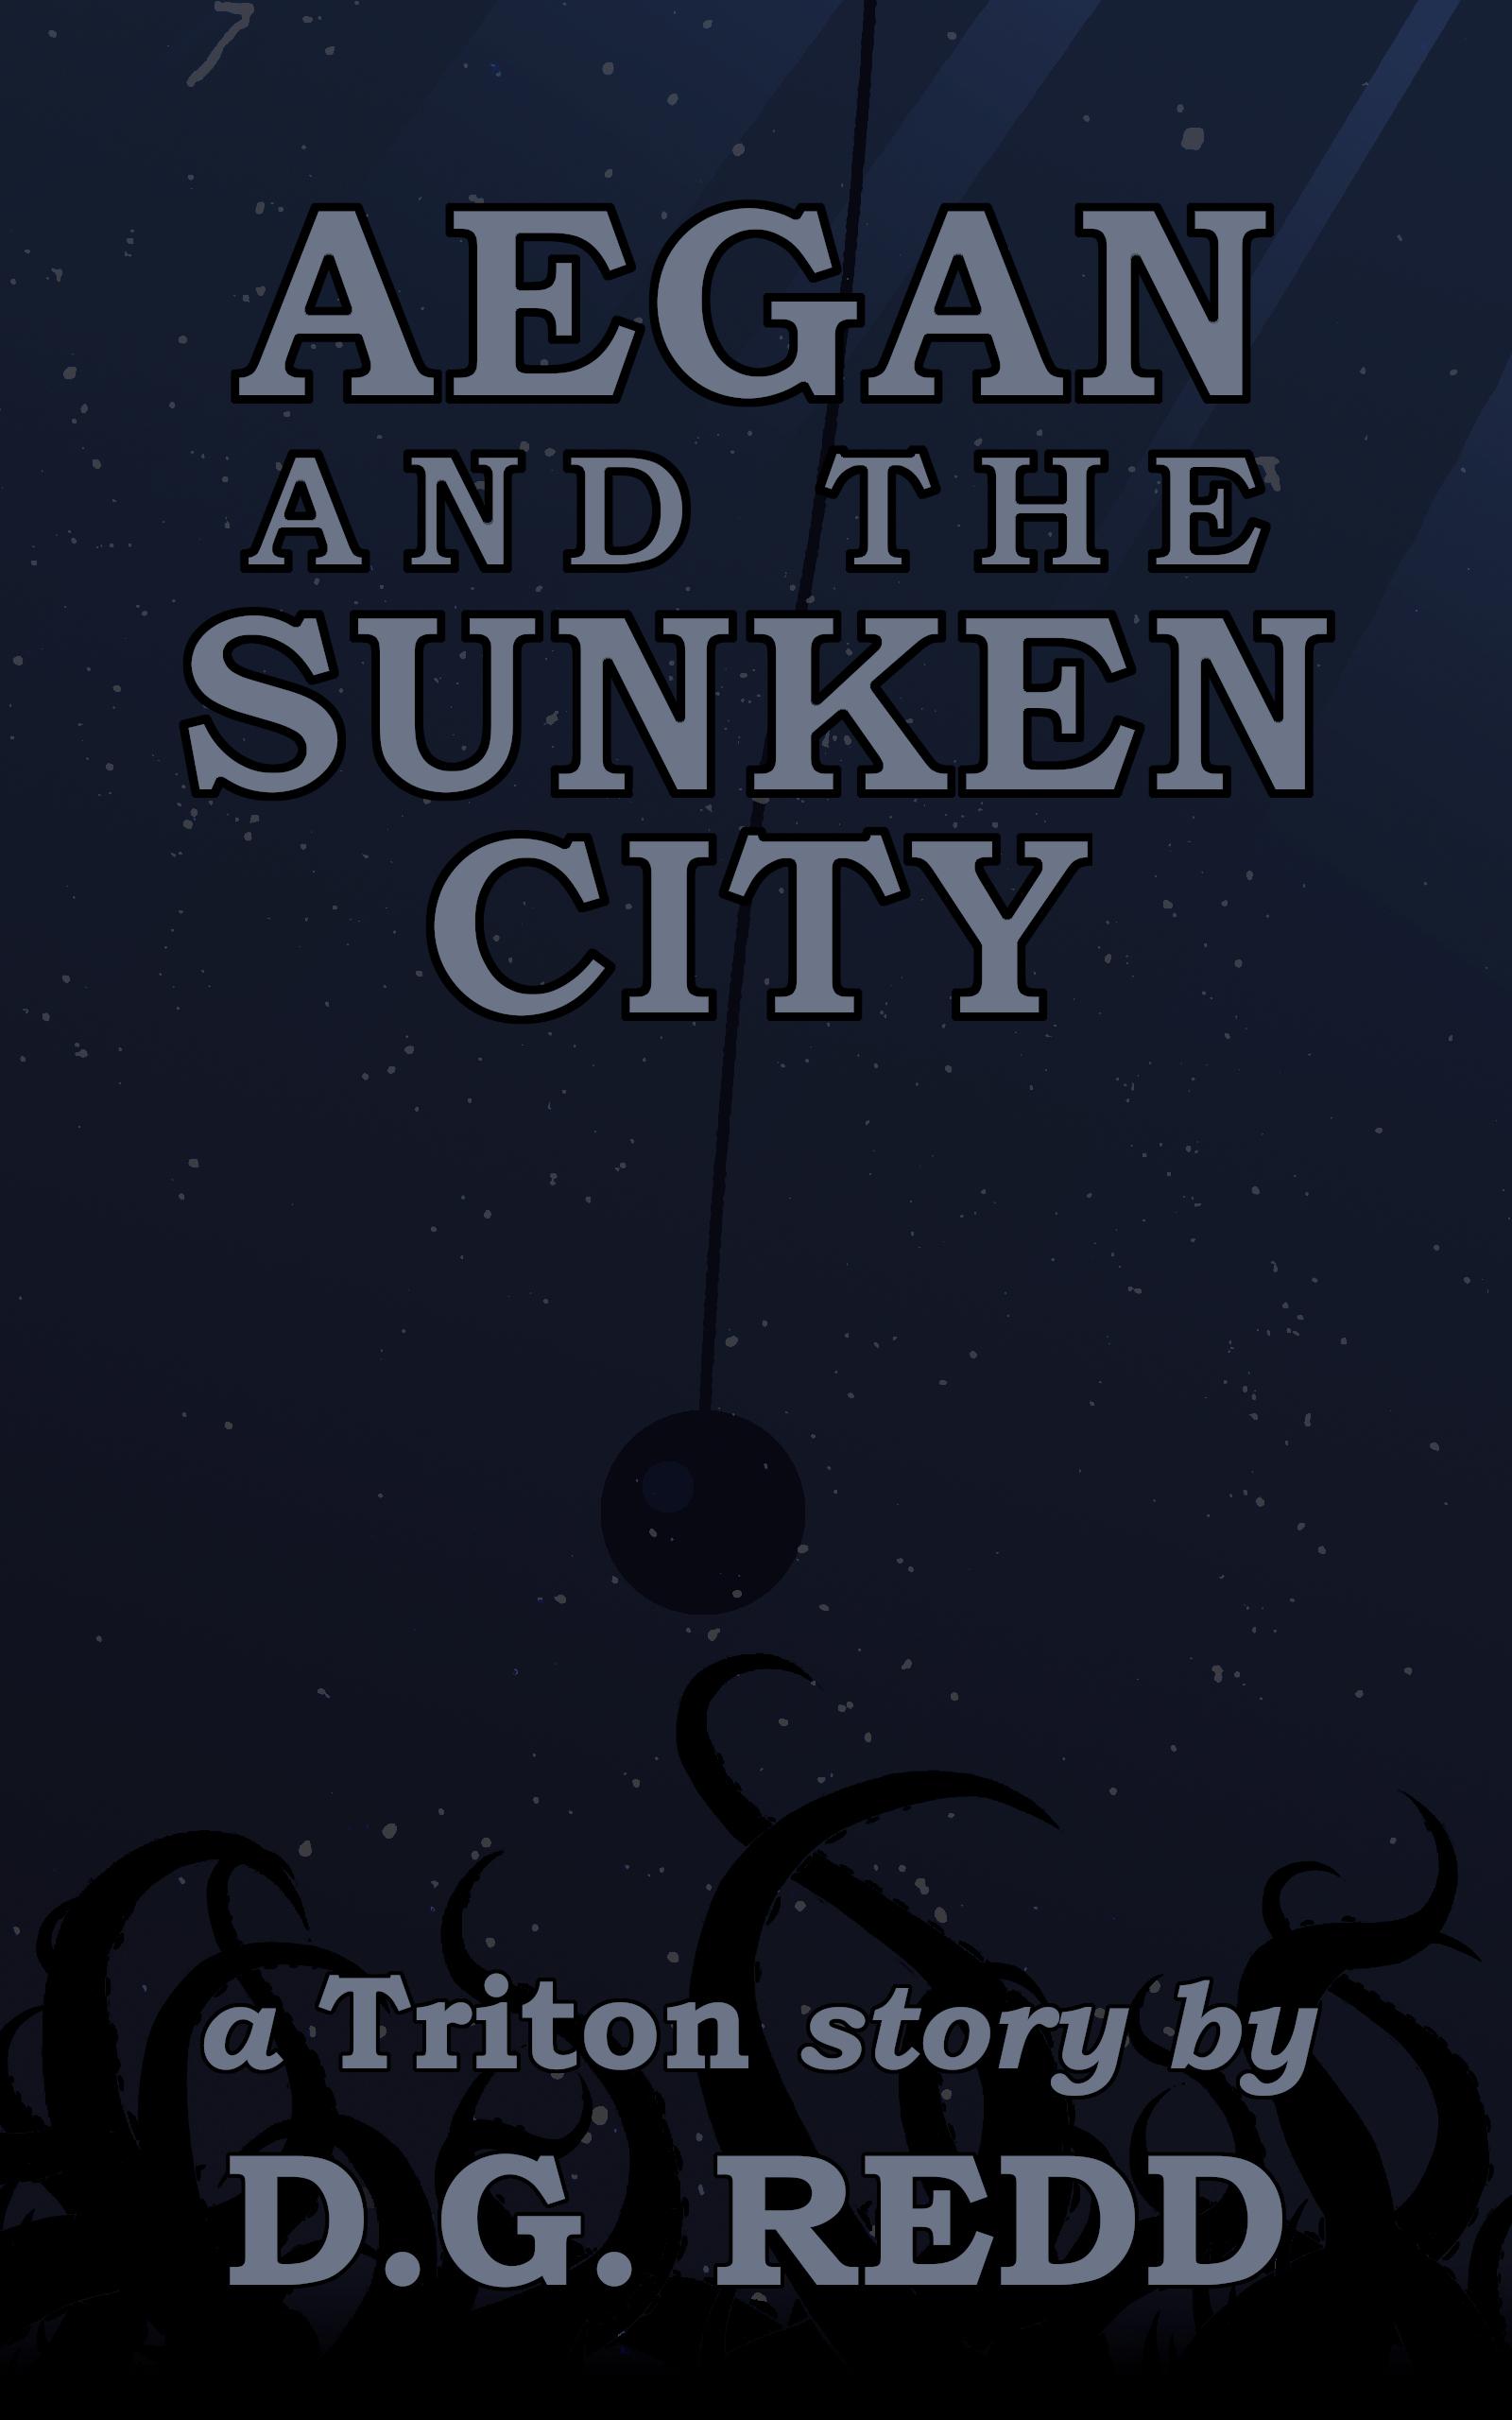 Aegan and the Sunken City